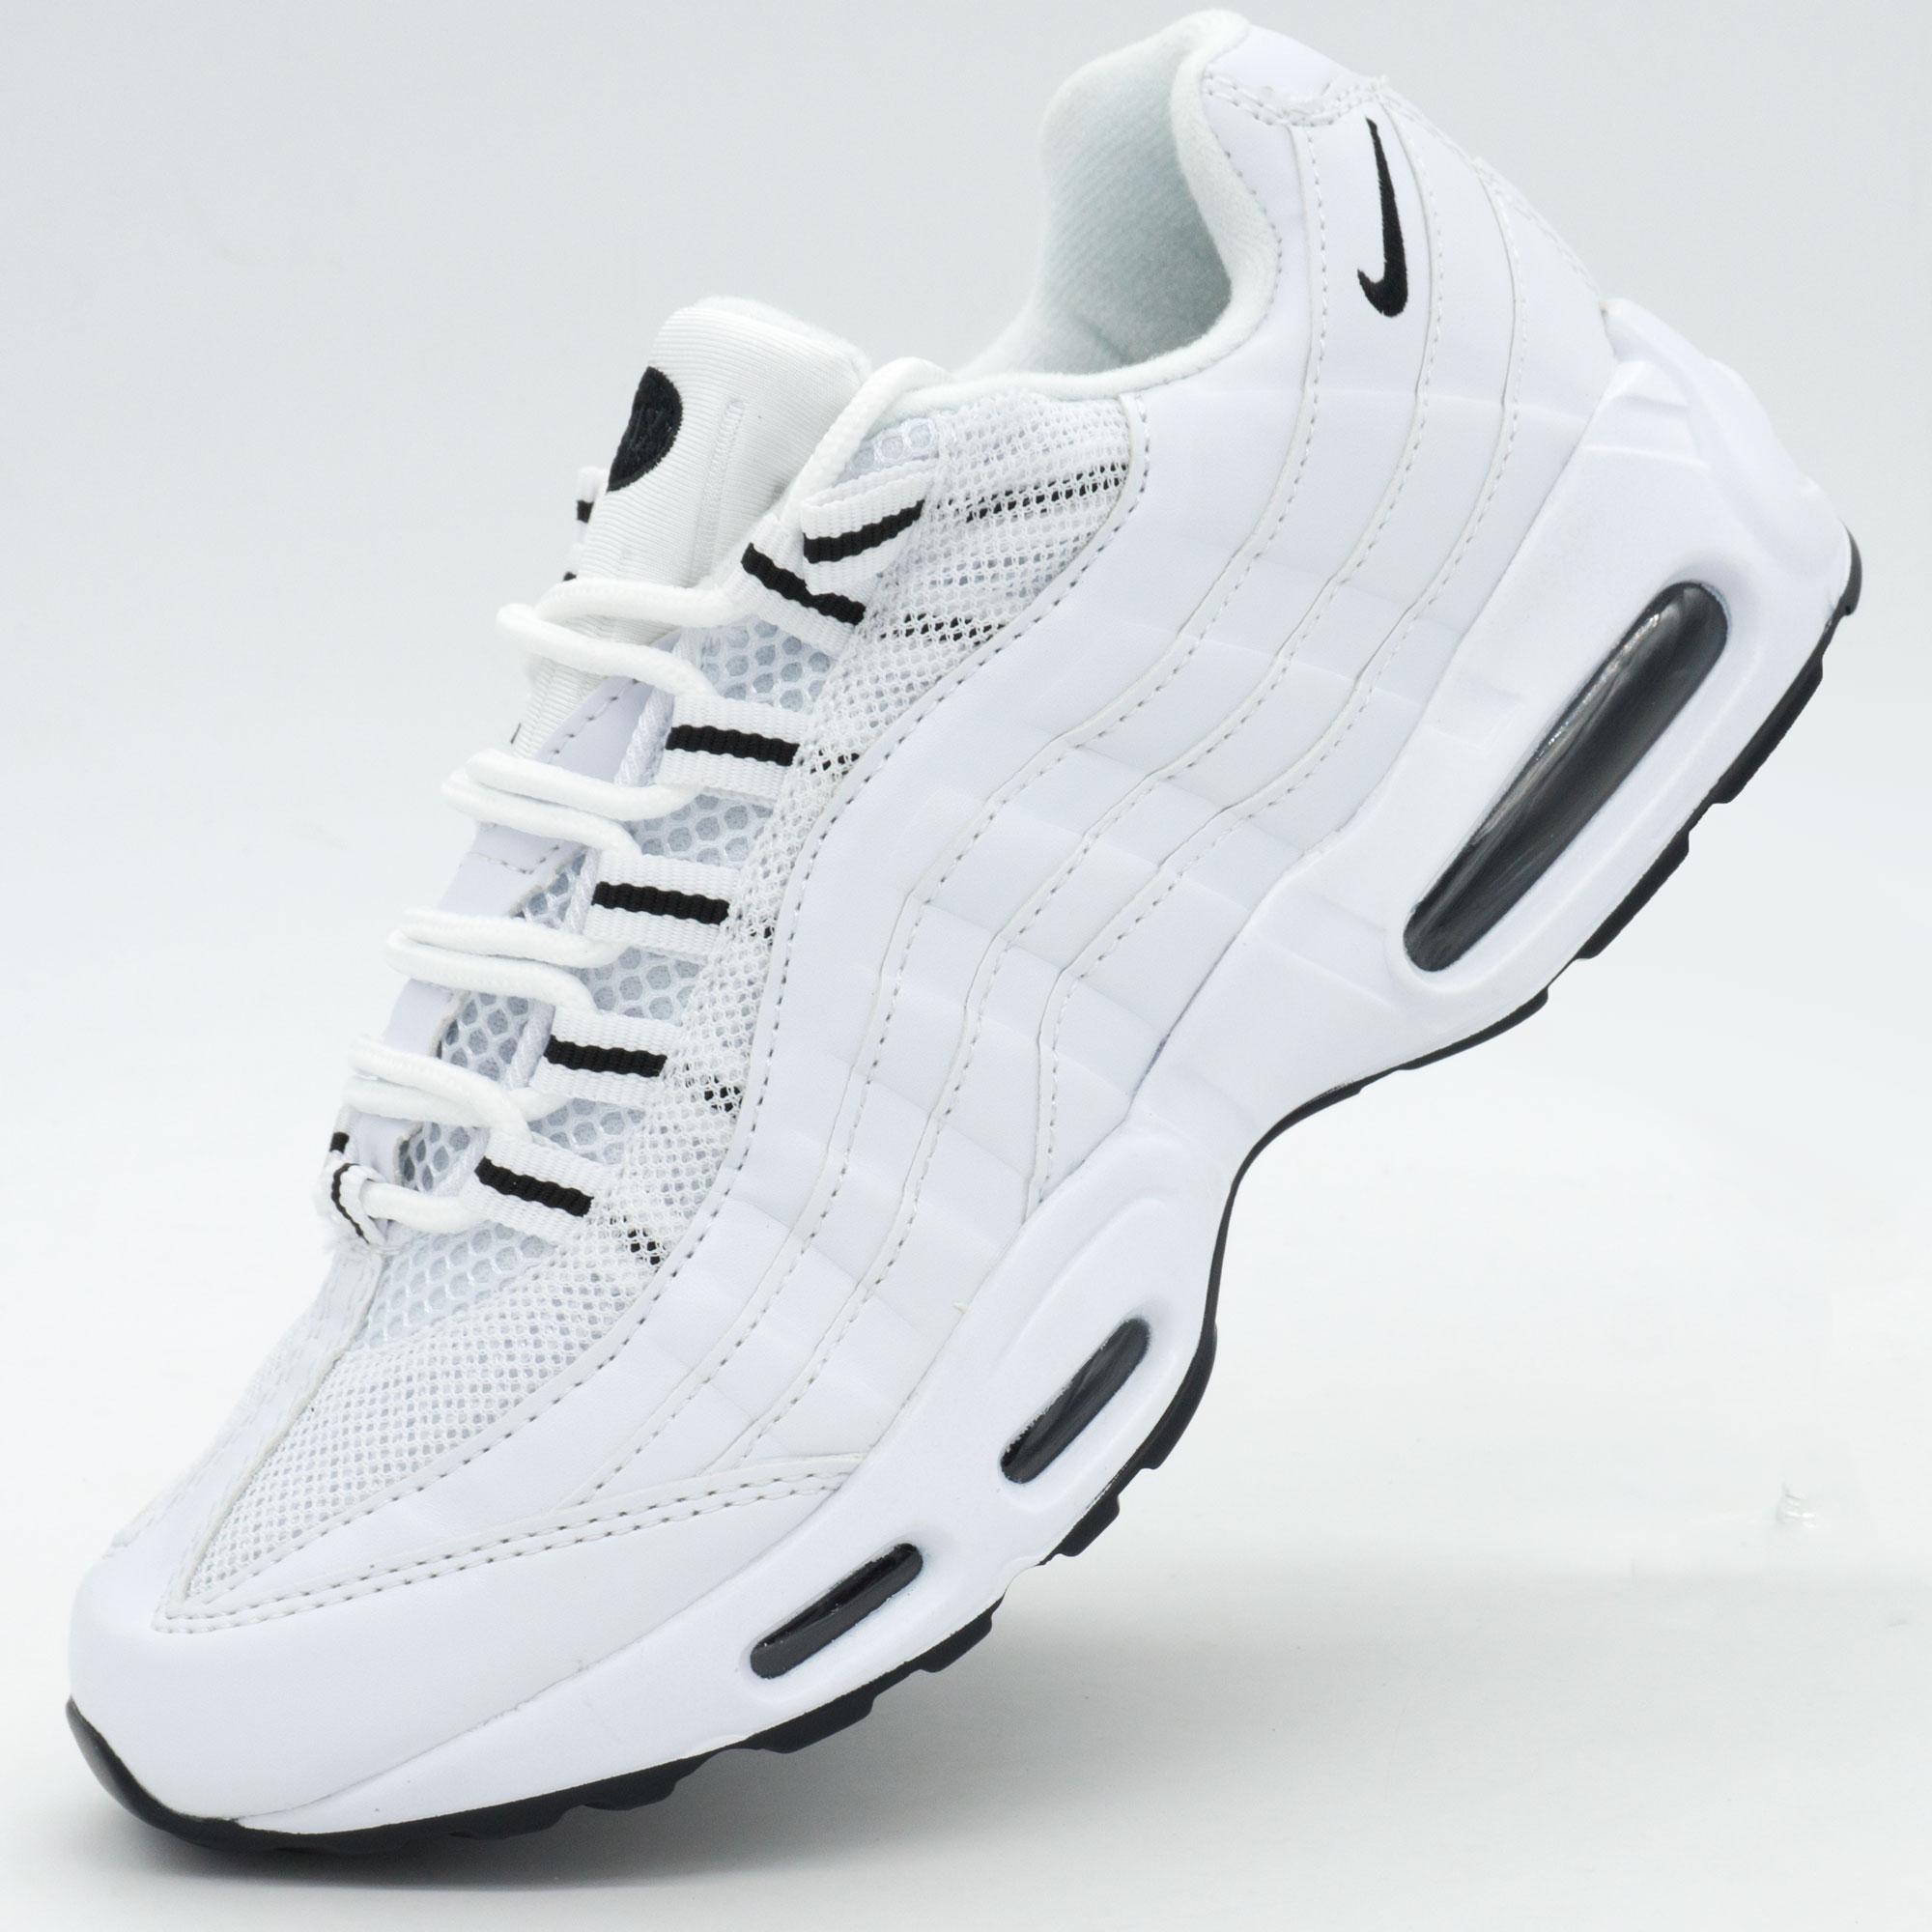 фото main Кроссовки Nike air max 95 полностью белые main